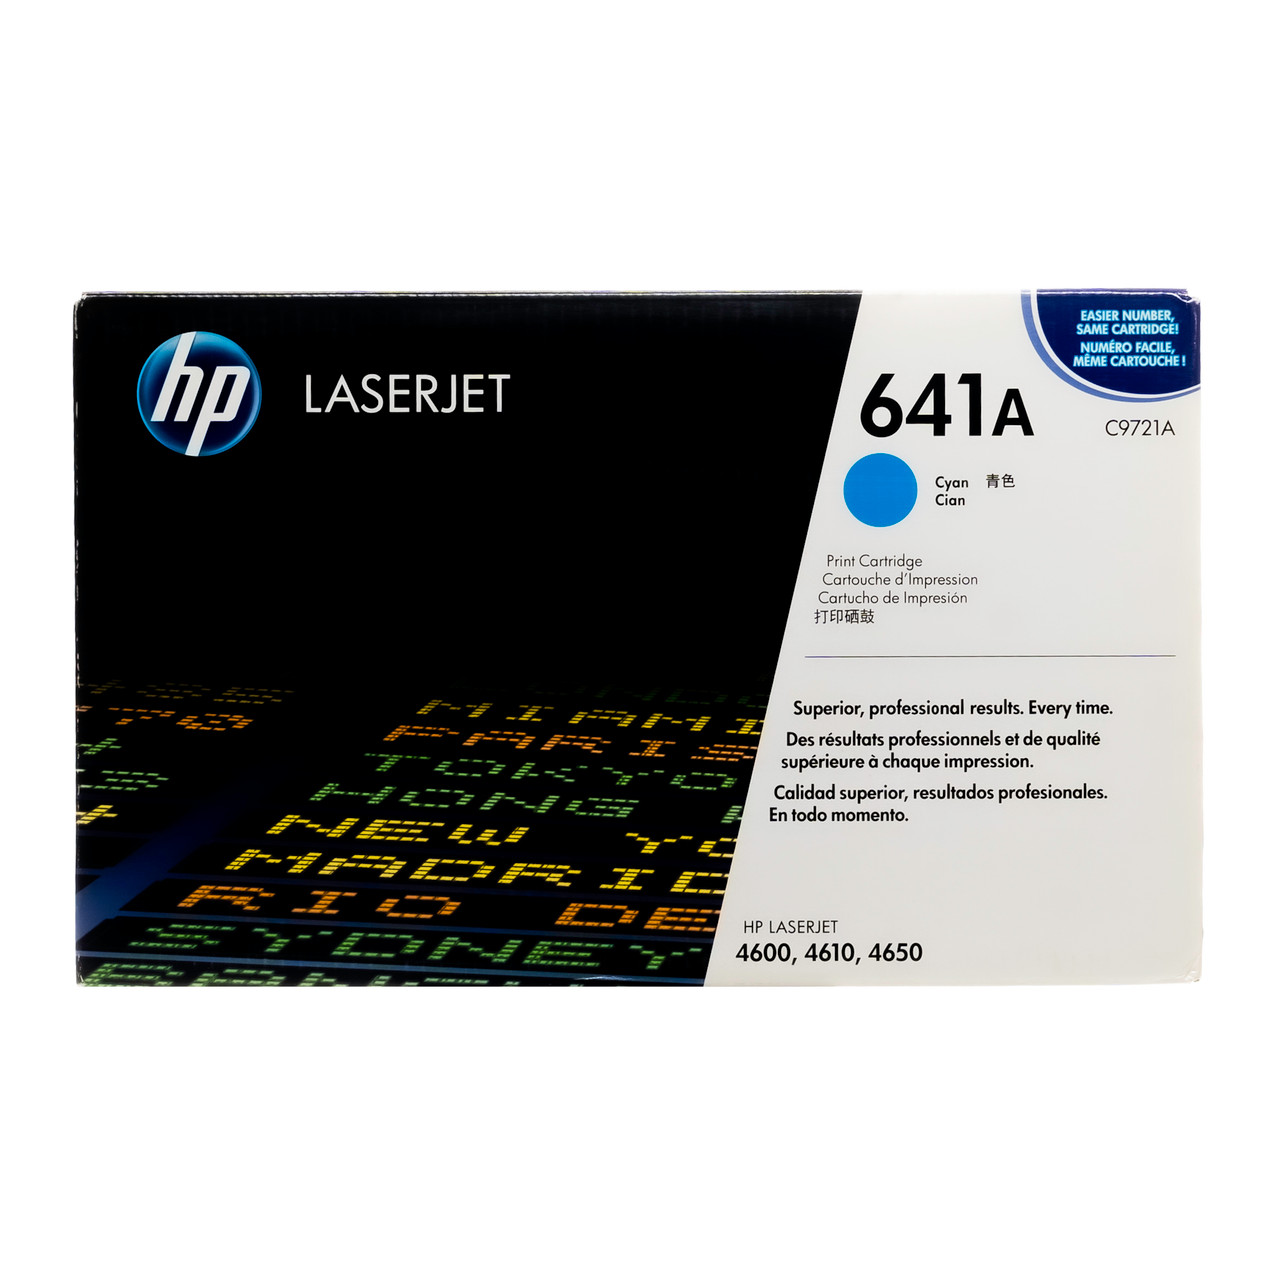 Lot 2 C9721A 641A Genuine HP Cyan Toner Color Laserjet 4600 4600DN 4600DTN